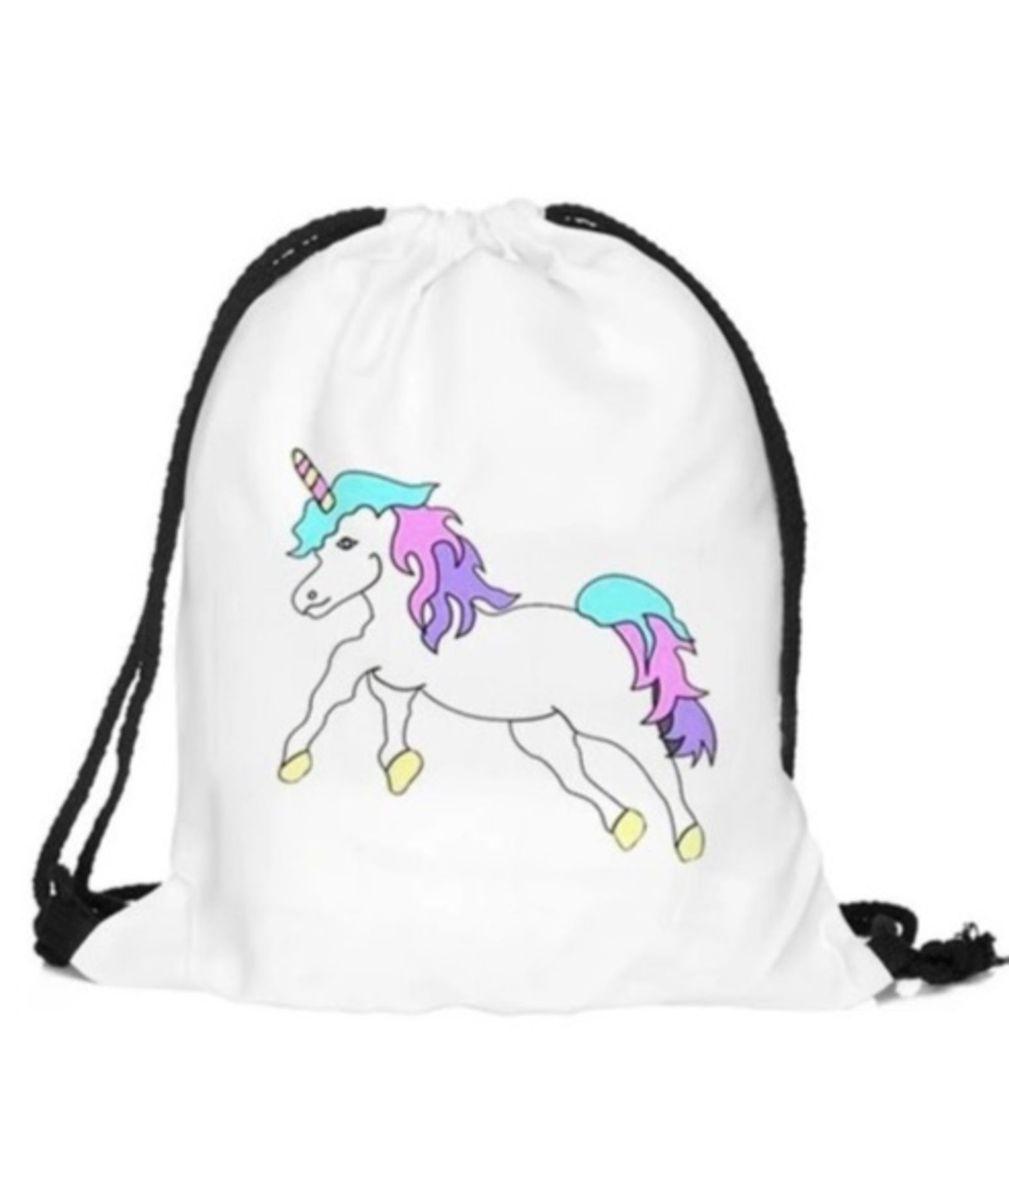 20ed9cfc3 mochila estilo saco unicornio - malas sem marca.  Czm6ly9wag90b3muzw5qb2vplmnvbs5ici9wcm9kdwn0cy80mty5ntuvntk5m2nimtc1owi4yzuyzgzjztk1mduyyza5zmy5ywyuanbn